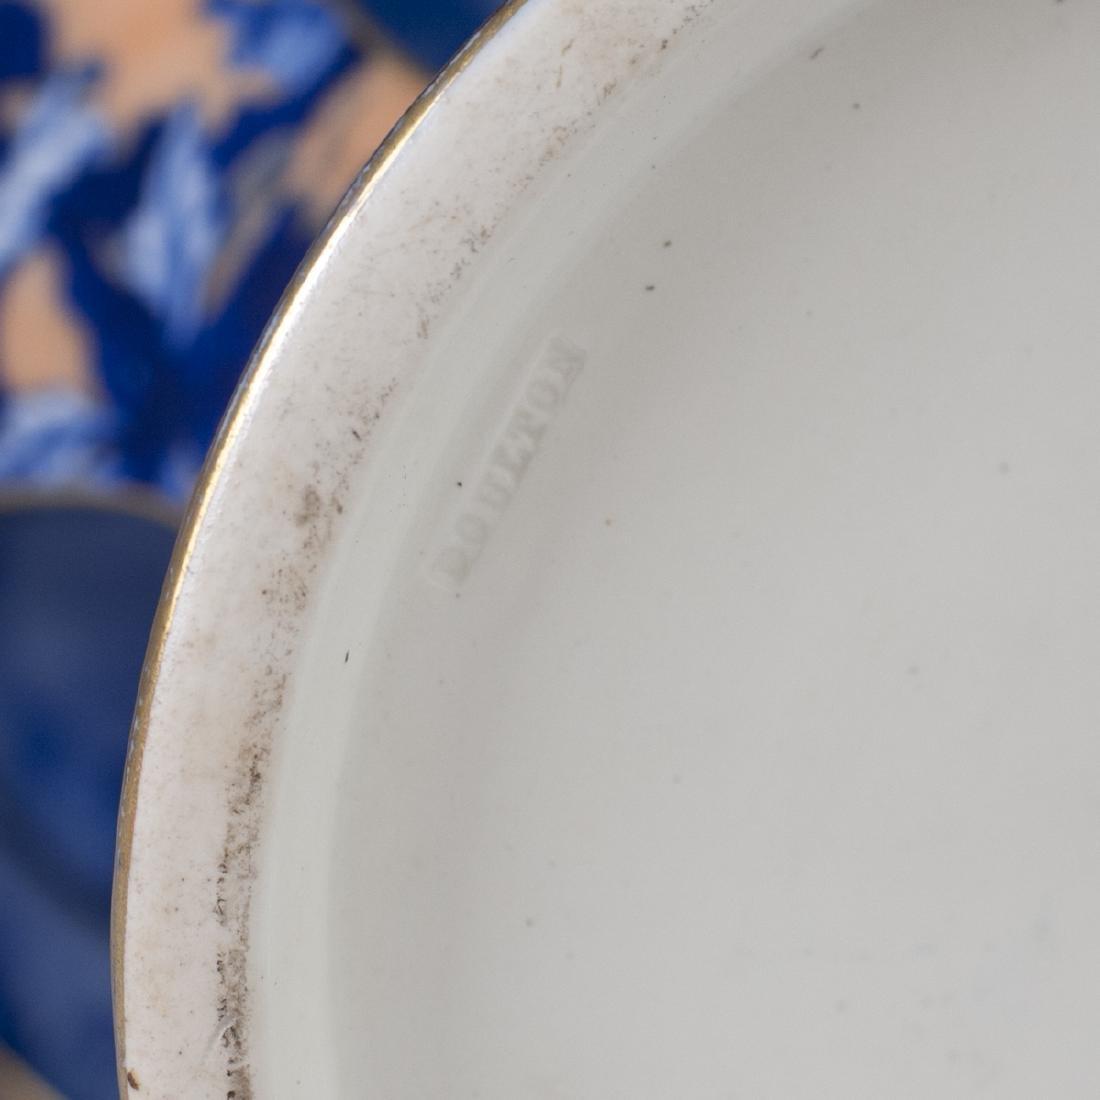 Doulton Burslem Porcelain Vase - 8